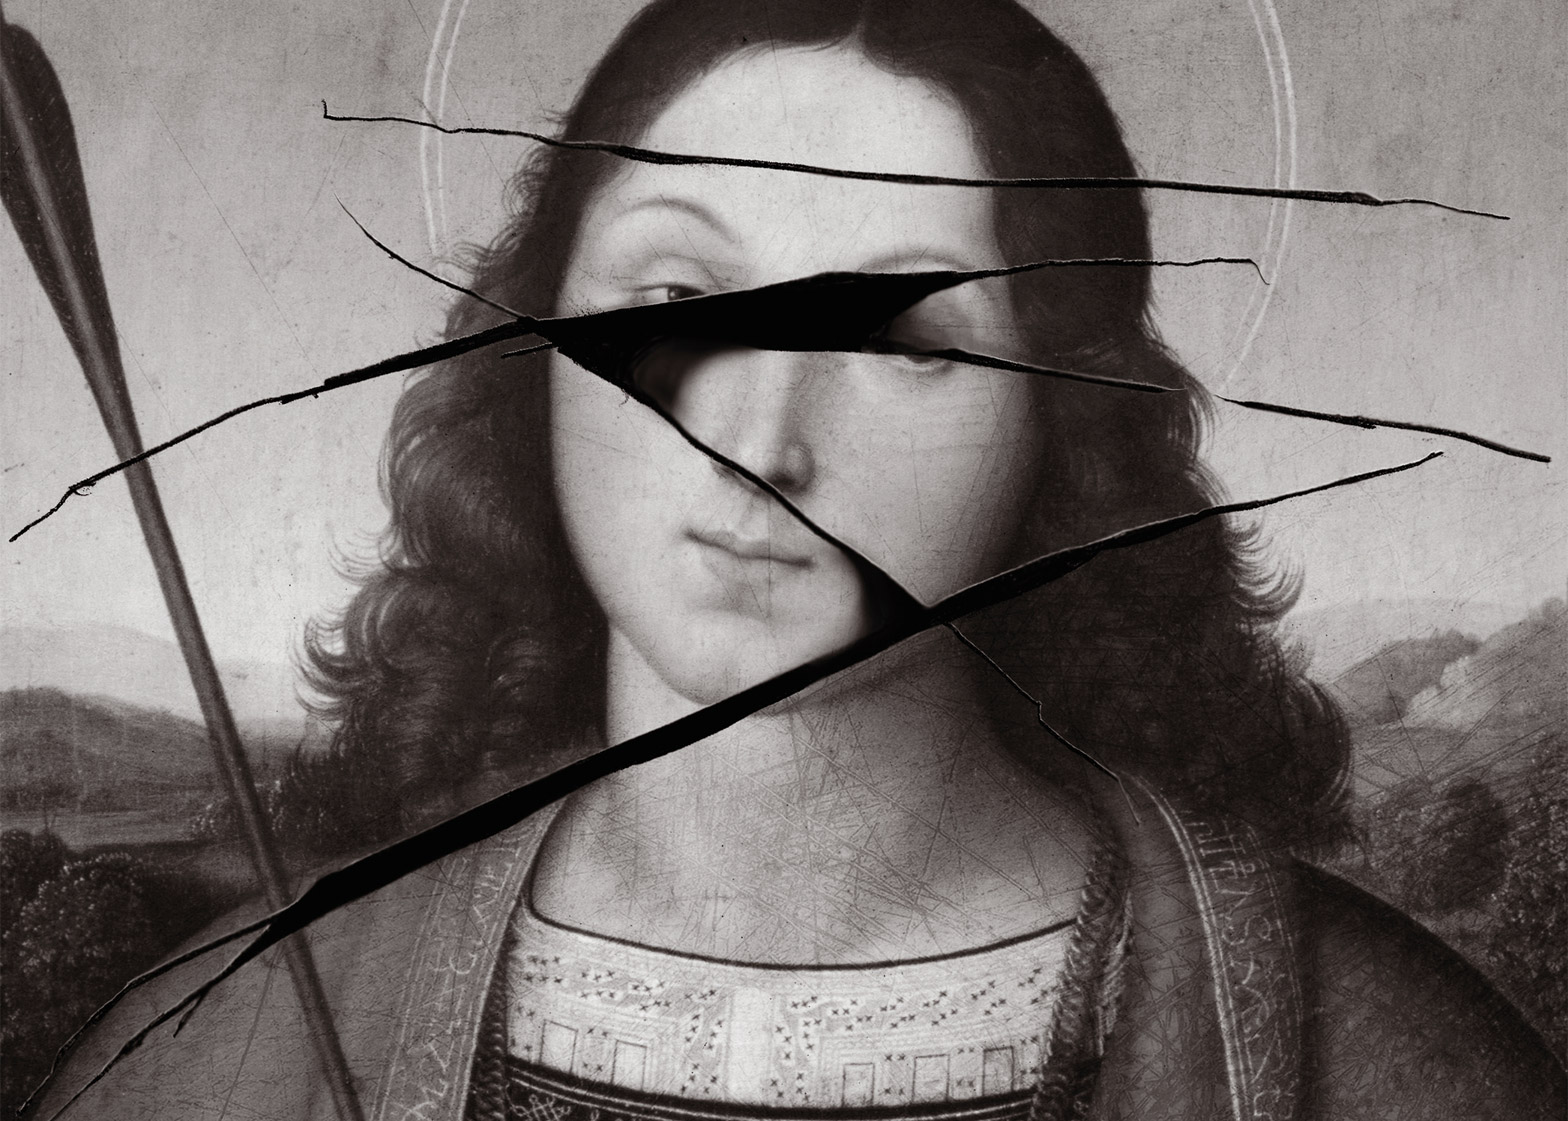 Album artwork for Heathen, 2002